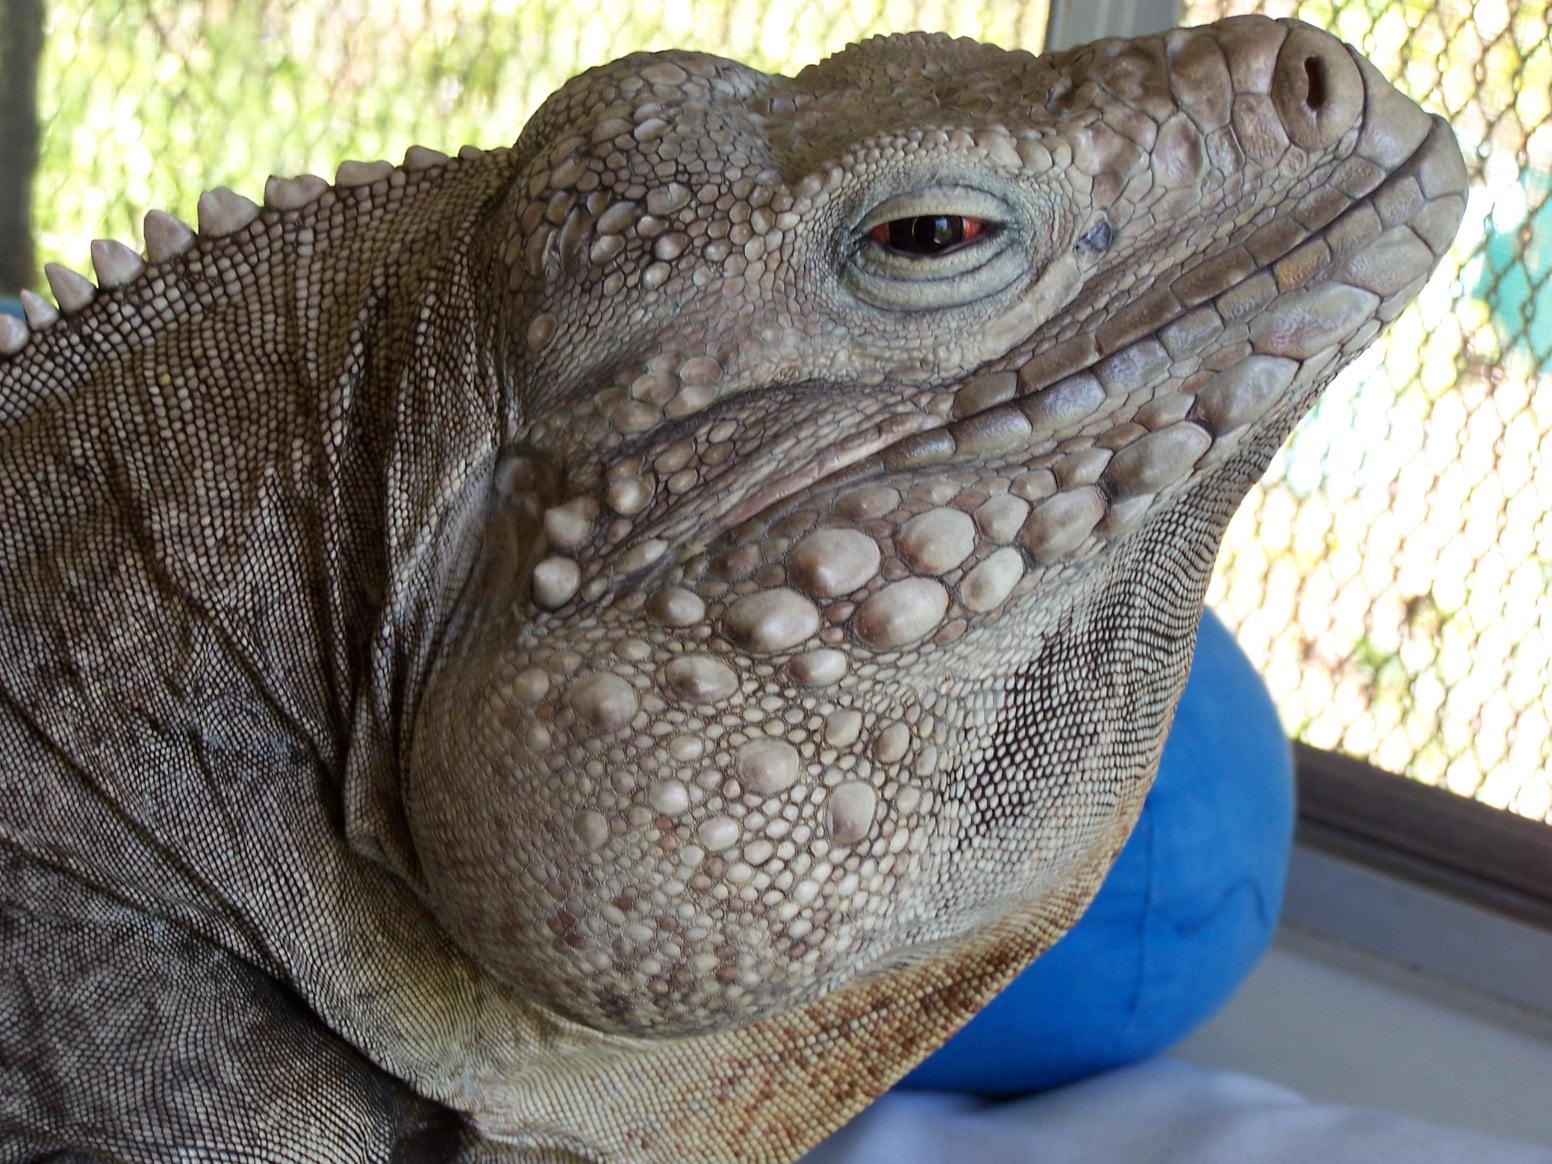 lizards in scarves